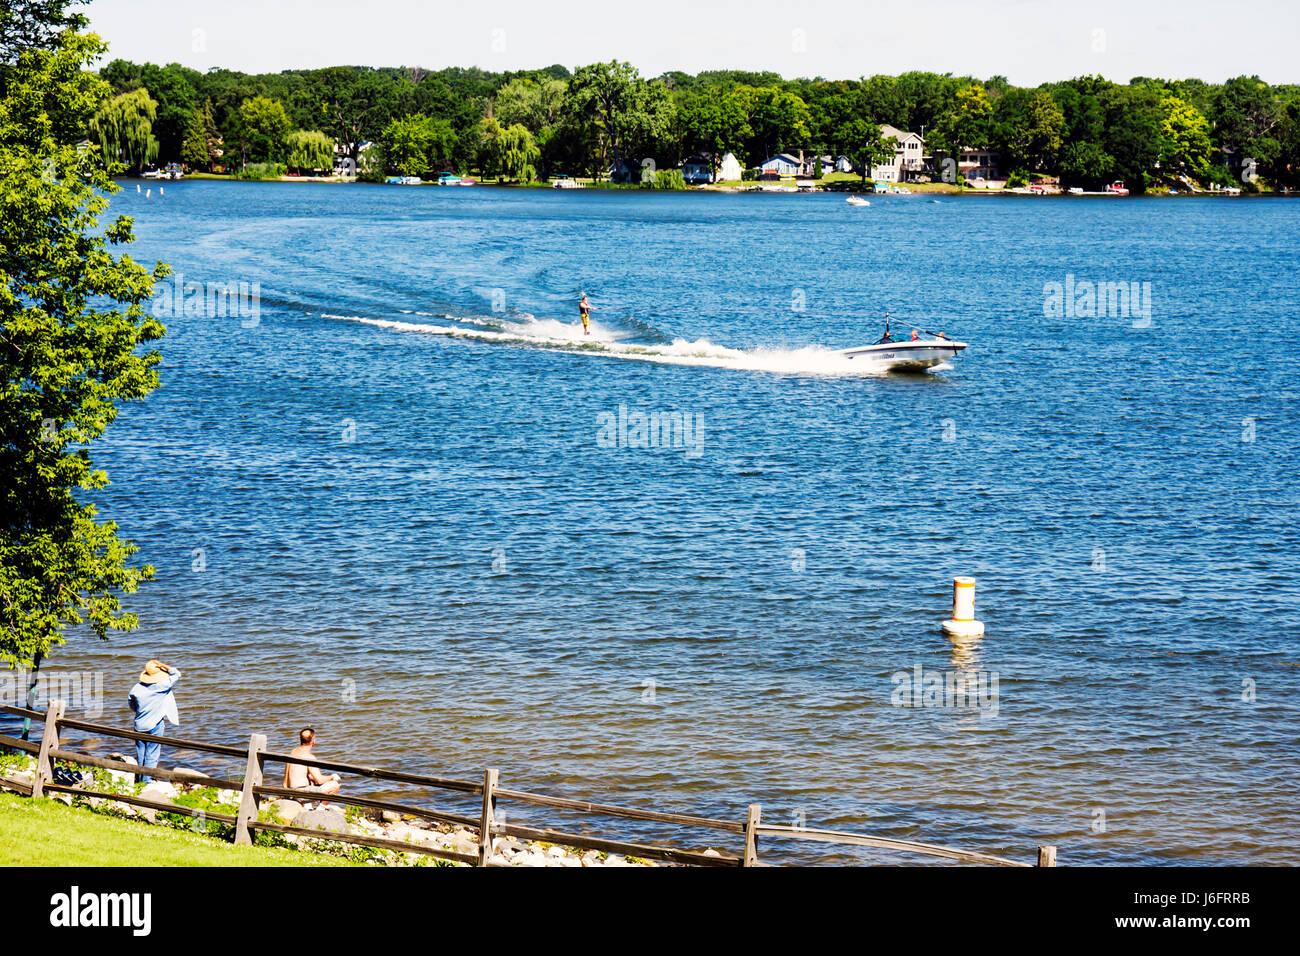 Wisconsin Kenosha Paddock Lake Old Settlers Park boating skiing water sport lakeshore scenic fishing - Stock Image